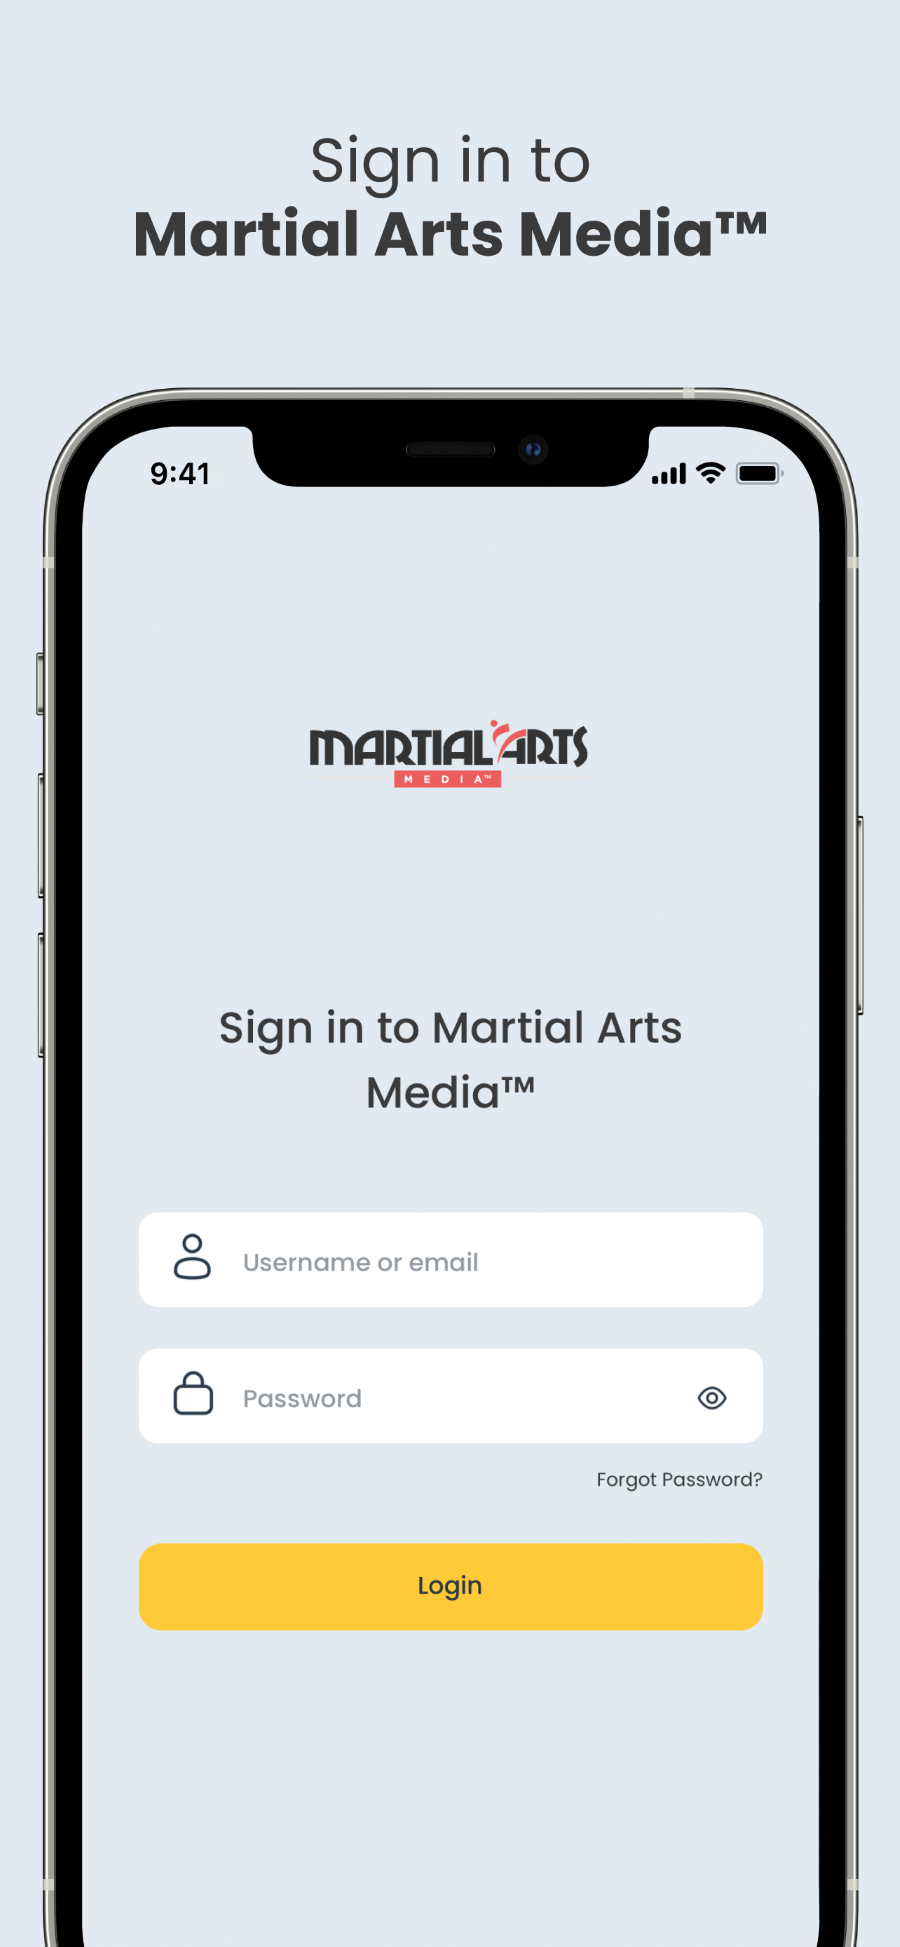 Martial Arts Media™ App Welcome Screen